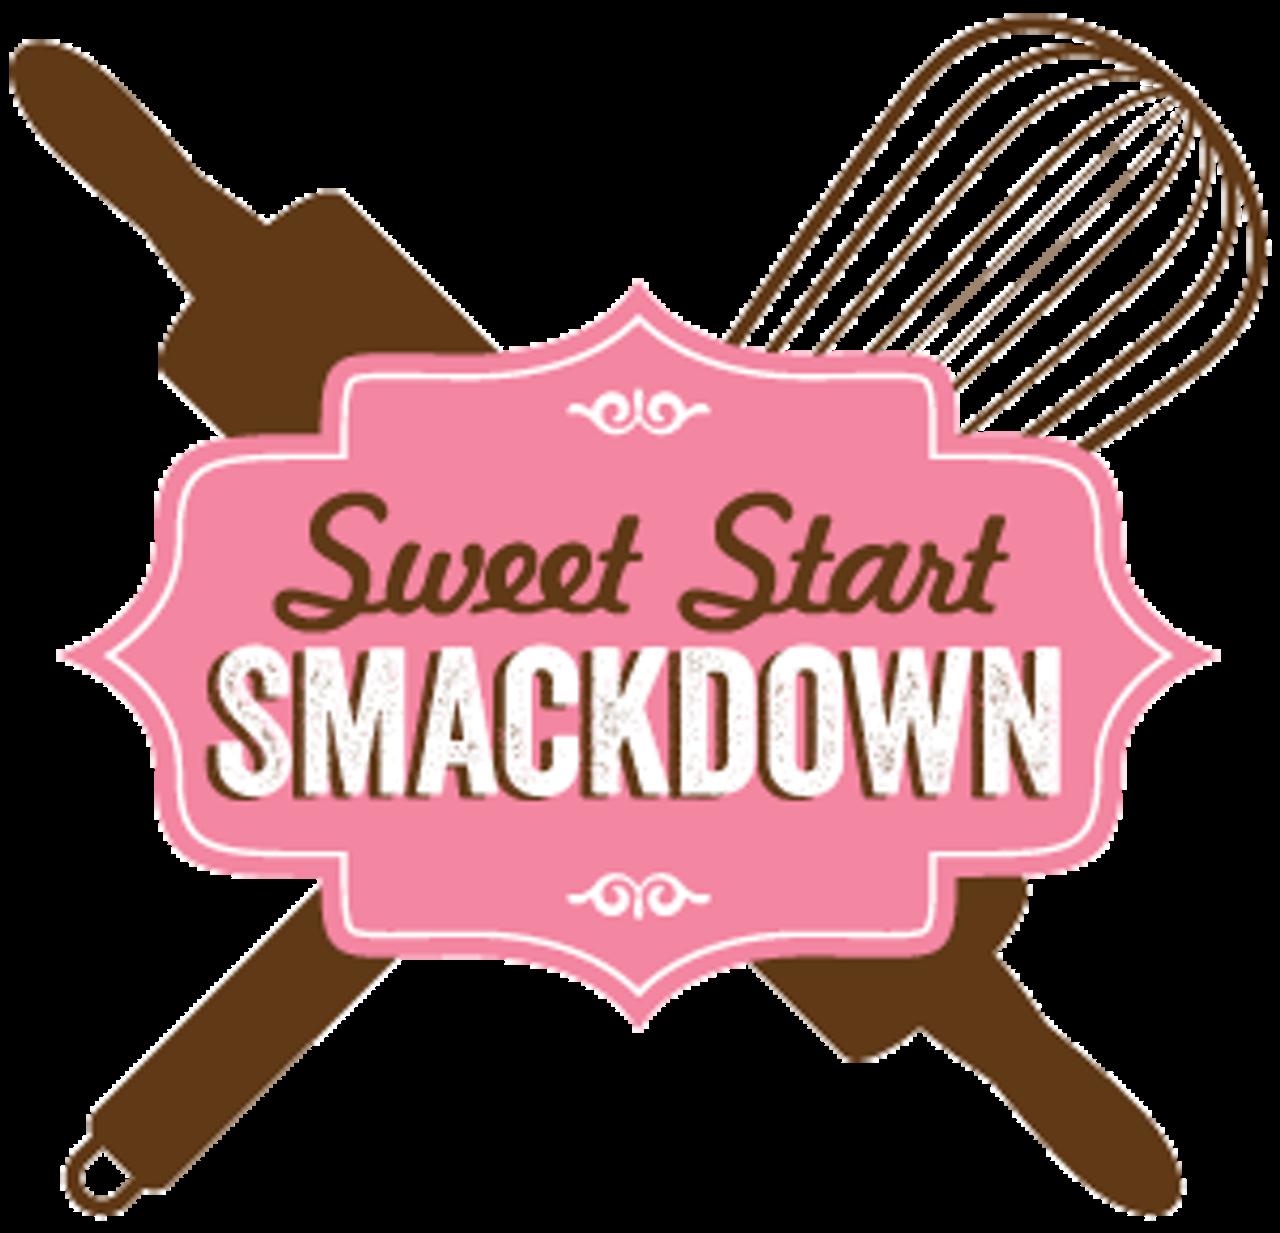 Sweet start smackdown vermont. Restaurants clipart pastry chef